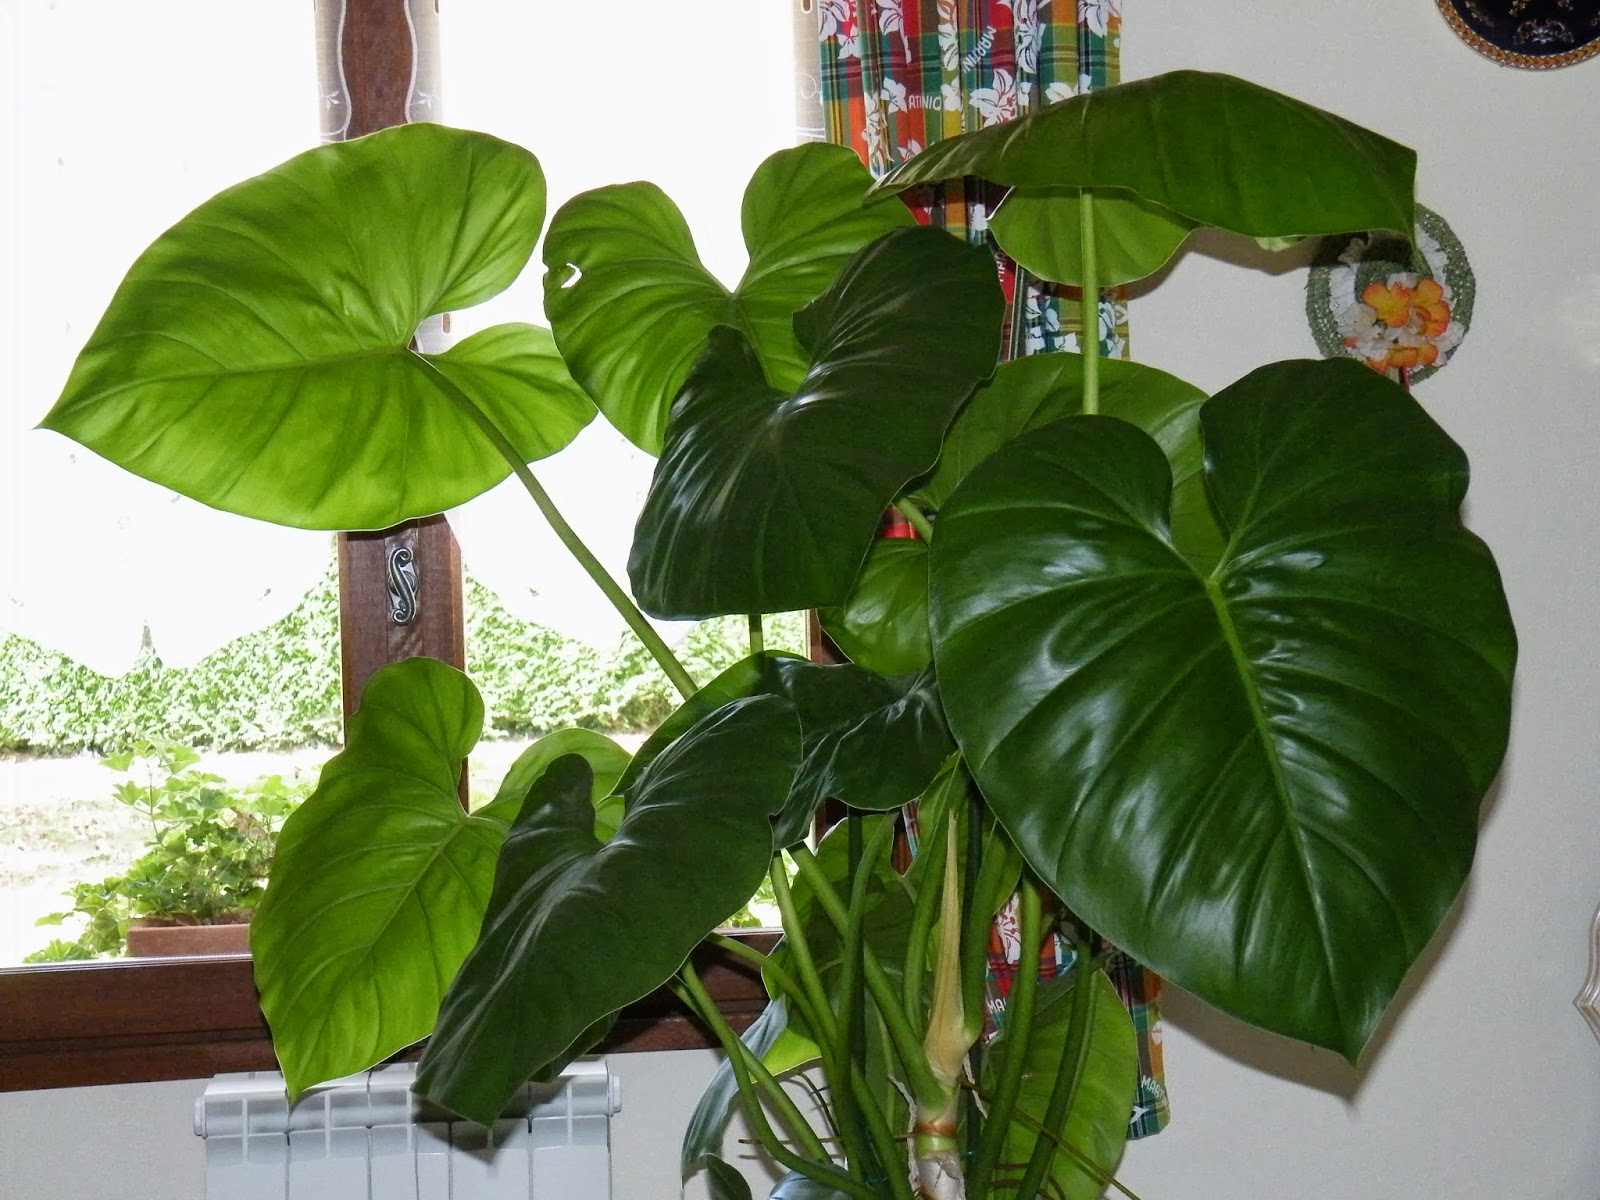 plante verte 9 feuilles